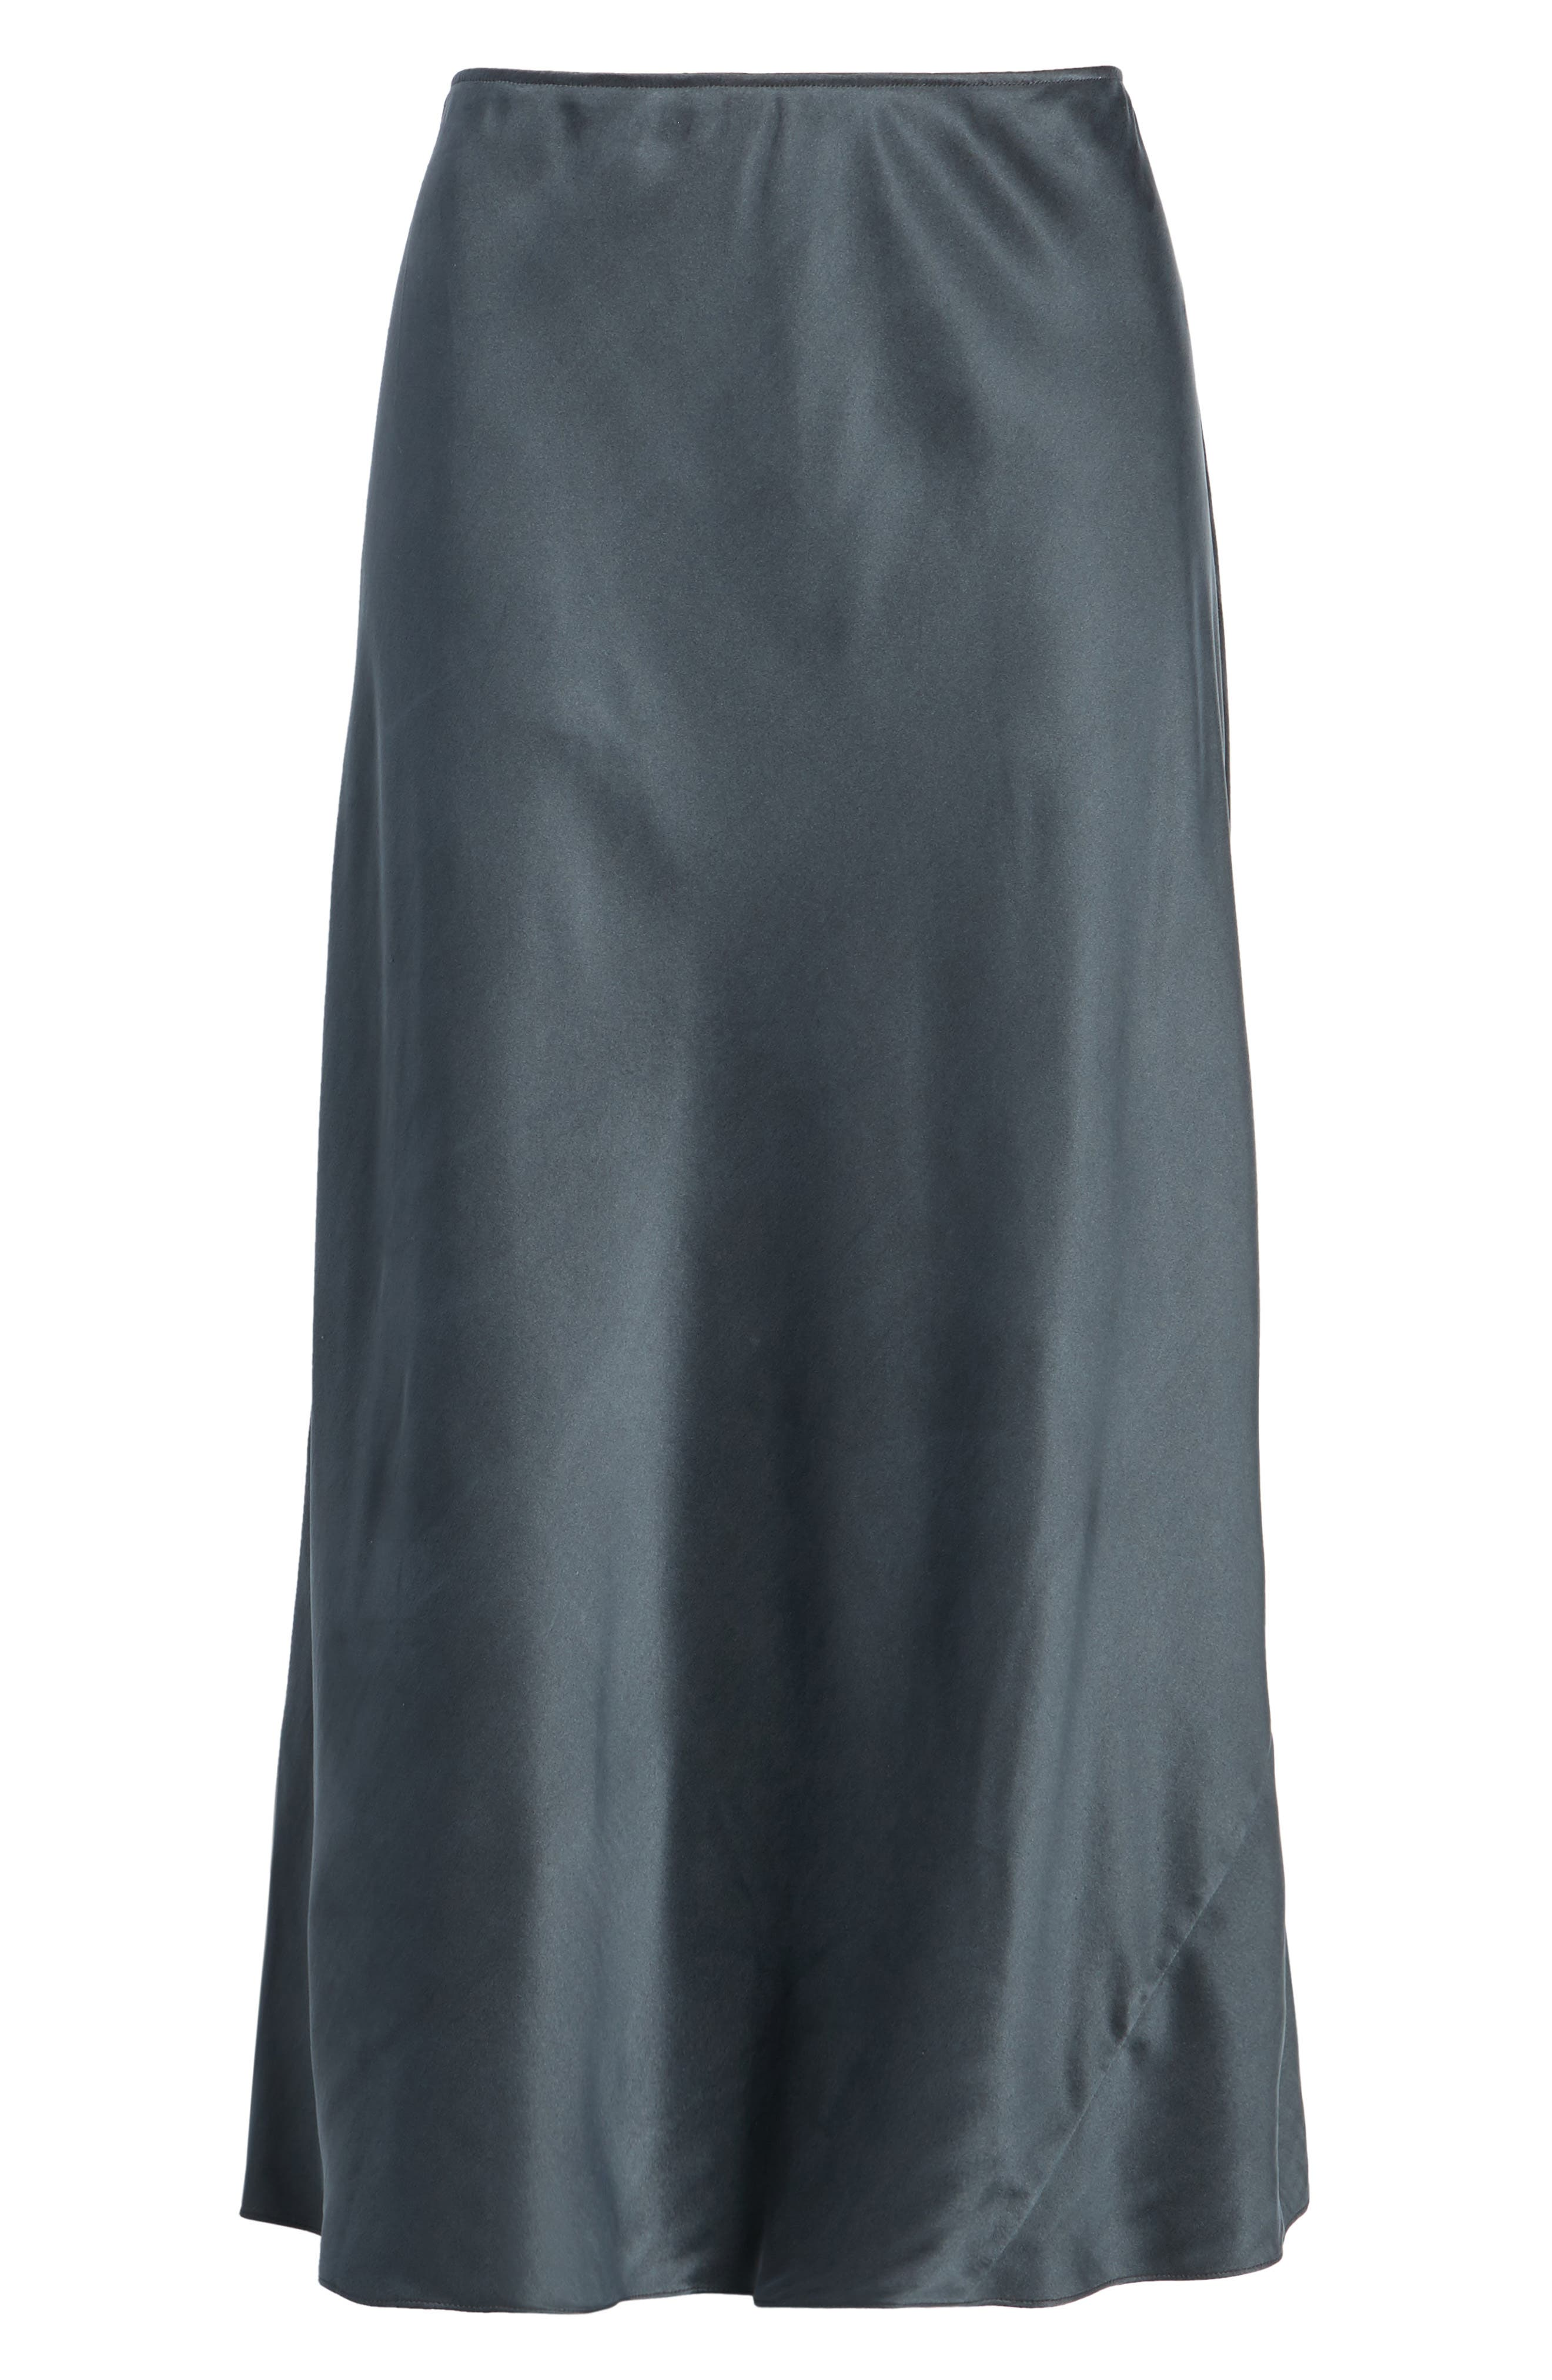 Bias Cut Silk Skirt,                             Alternate thumbnail 6, color,                             025